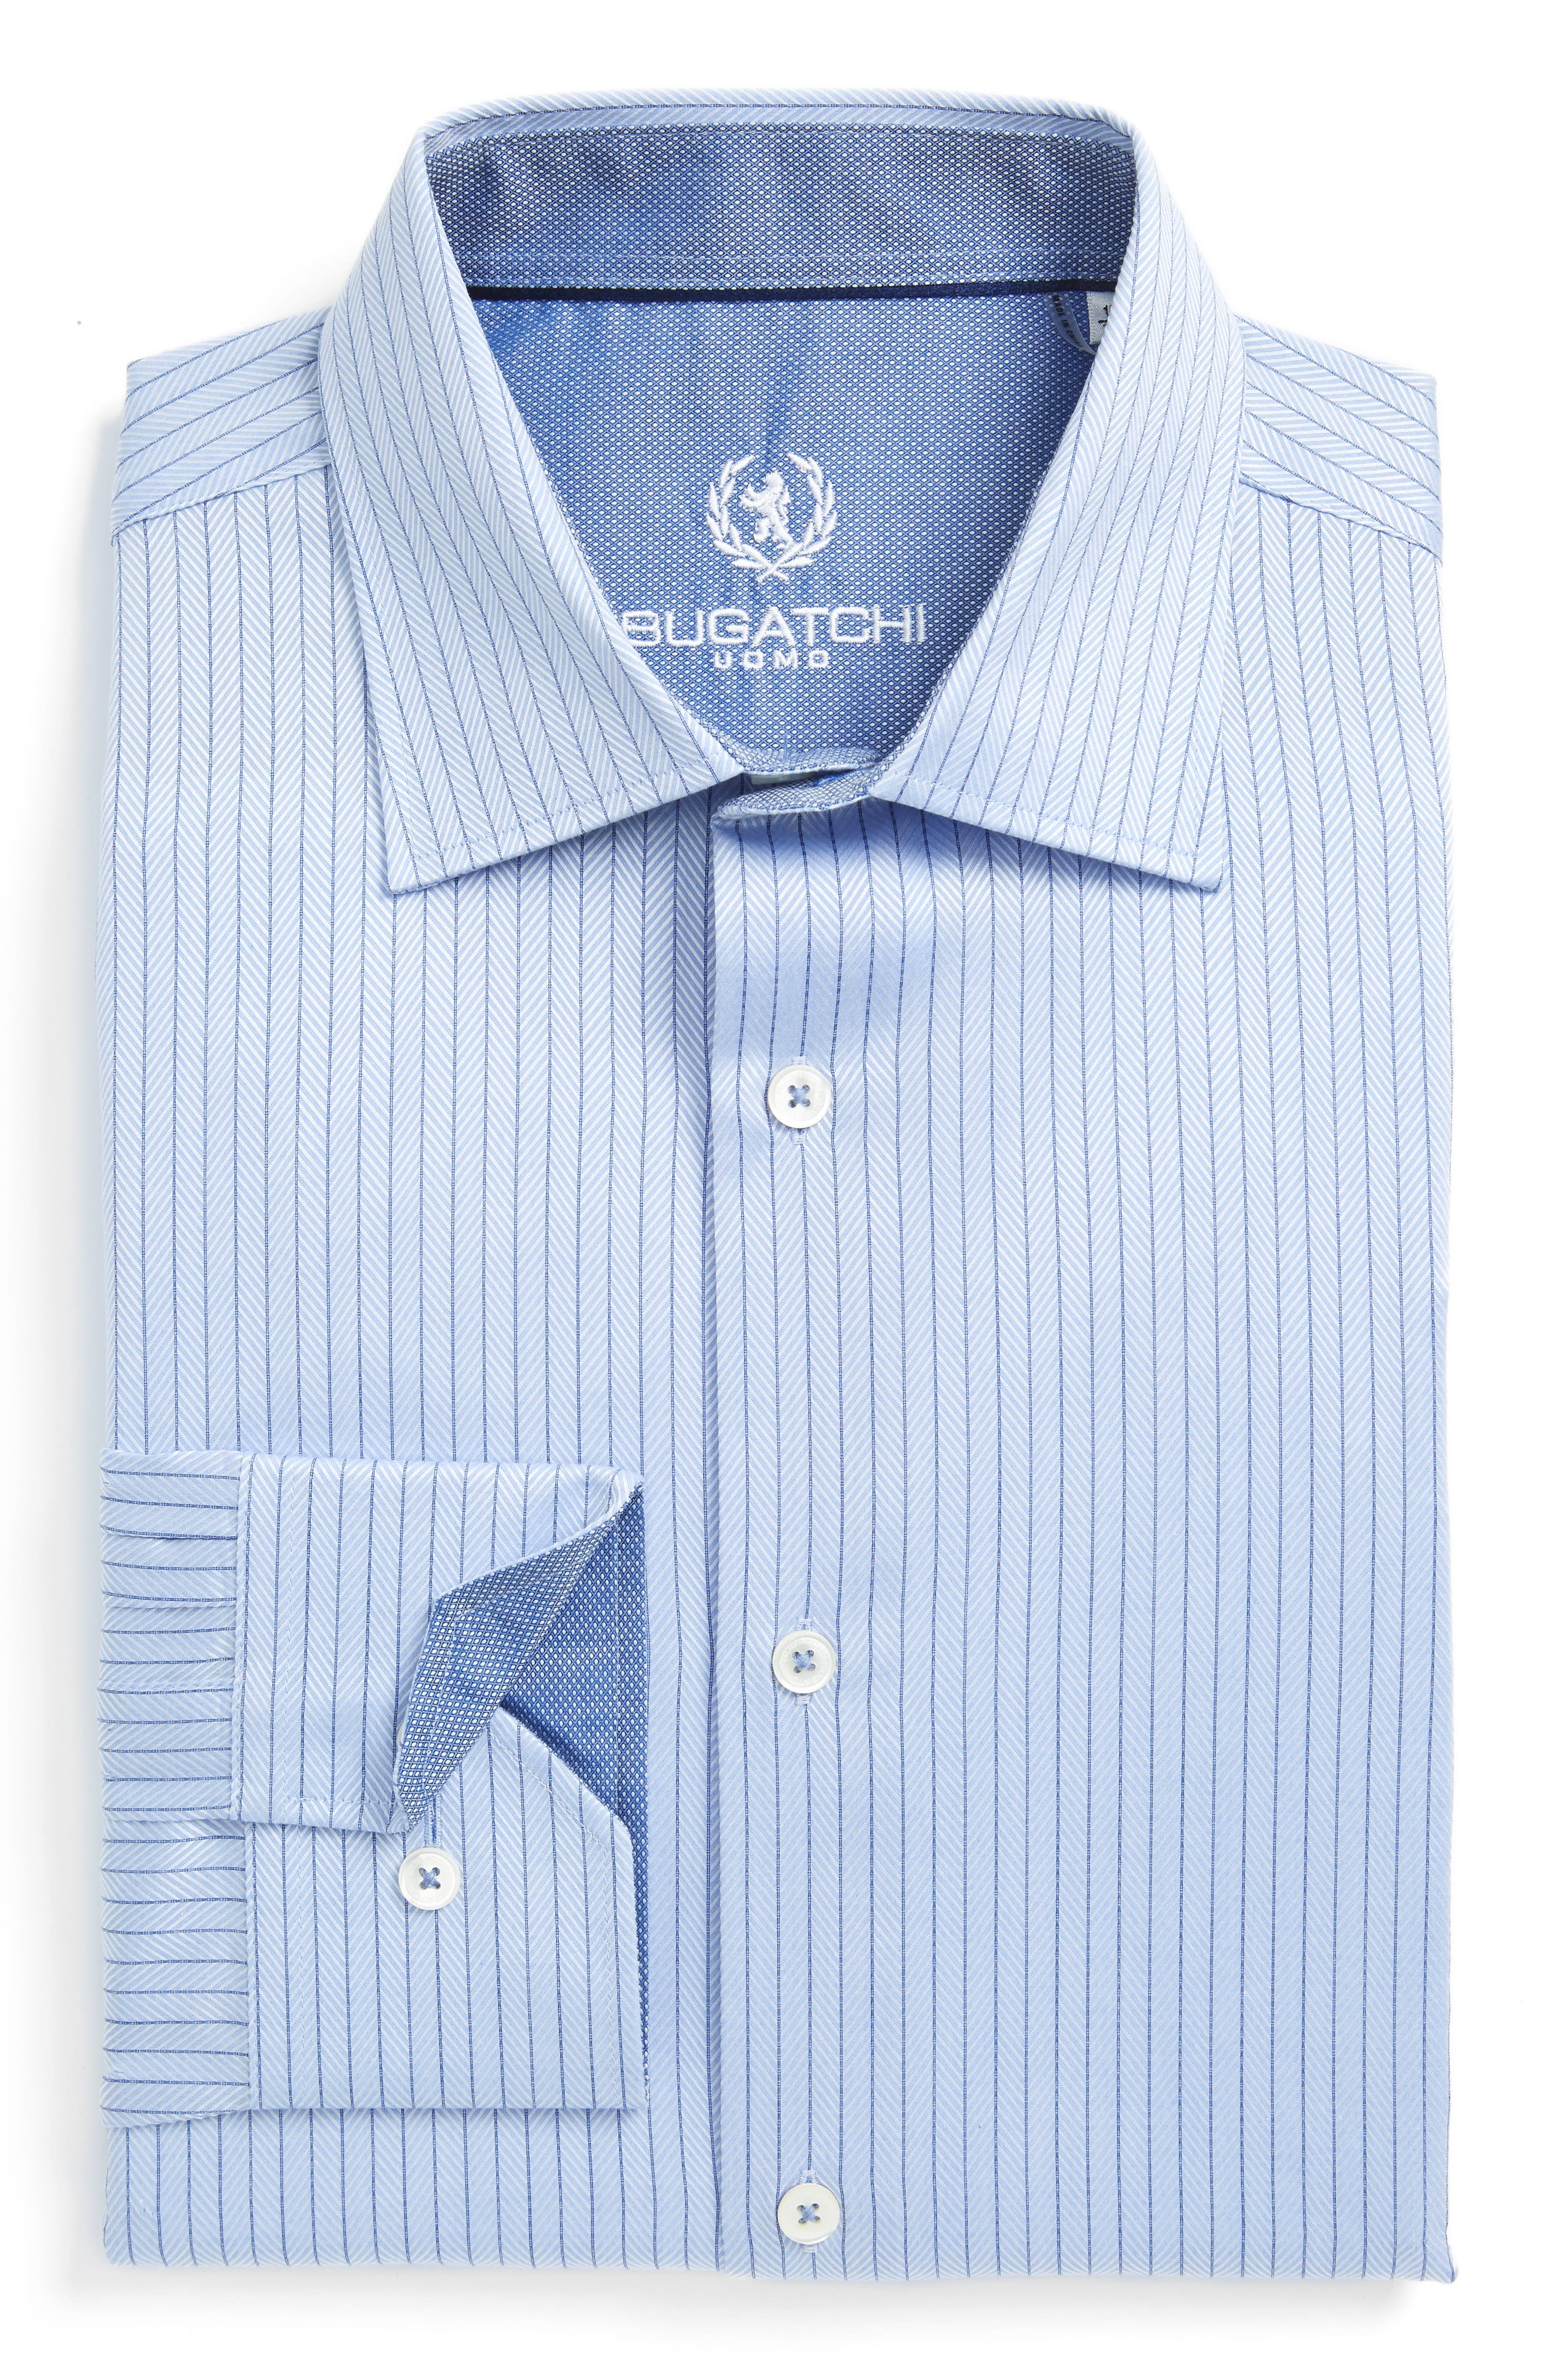 Bugatchi Trim Fit Herringbone Dress Shirt